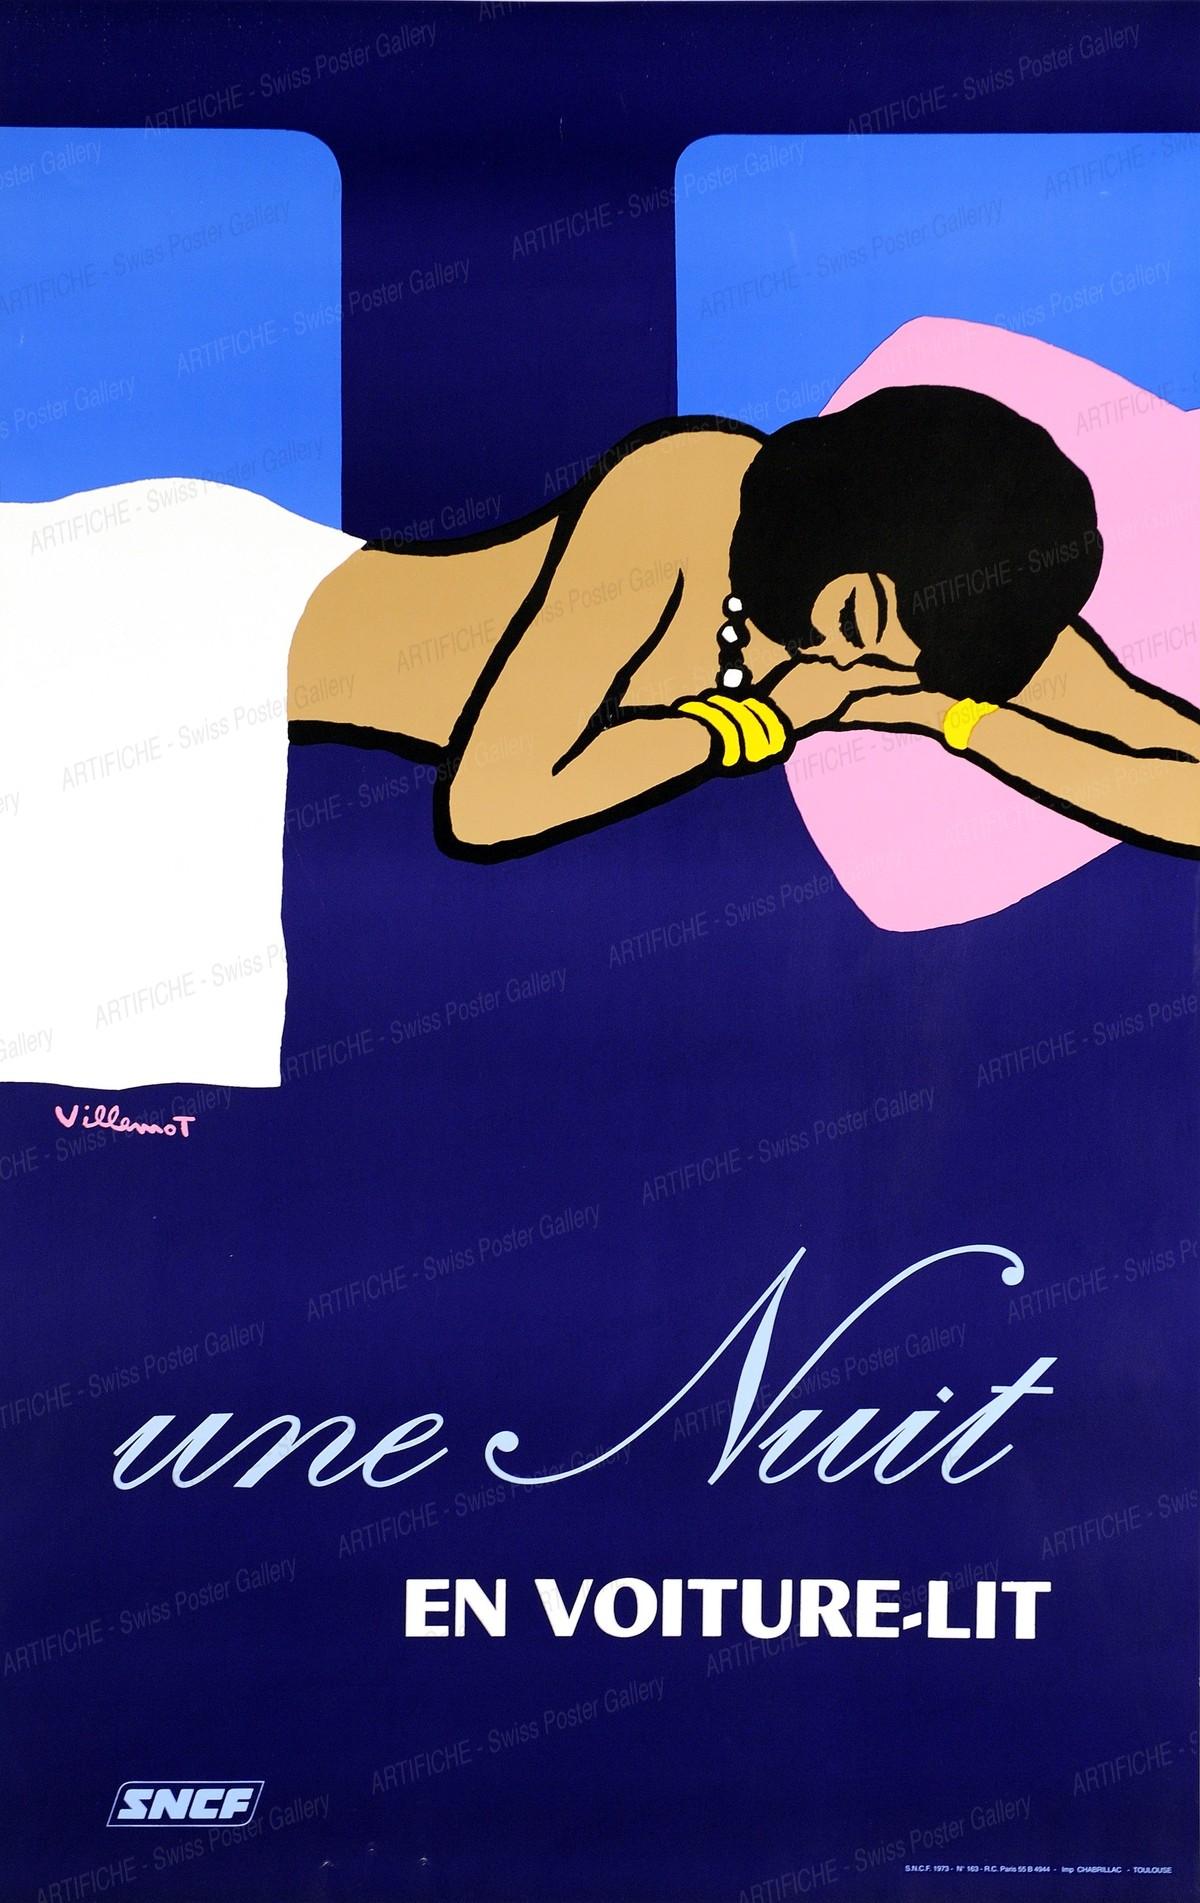 Une Nuit EN VOITURE-LIT – SNCF, Bernard Villemot